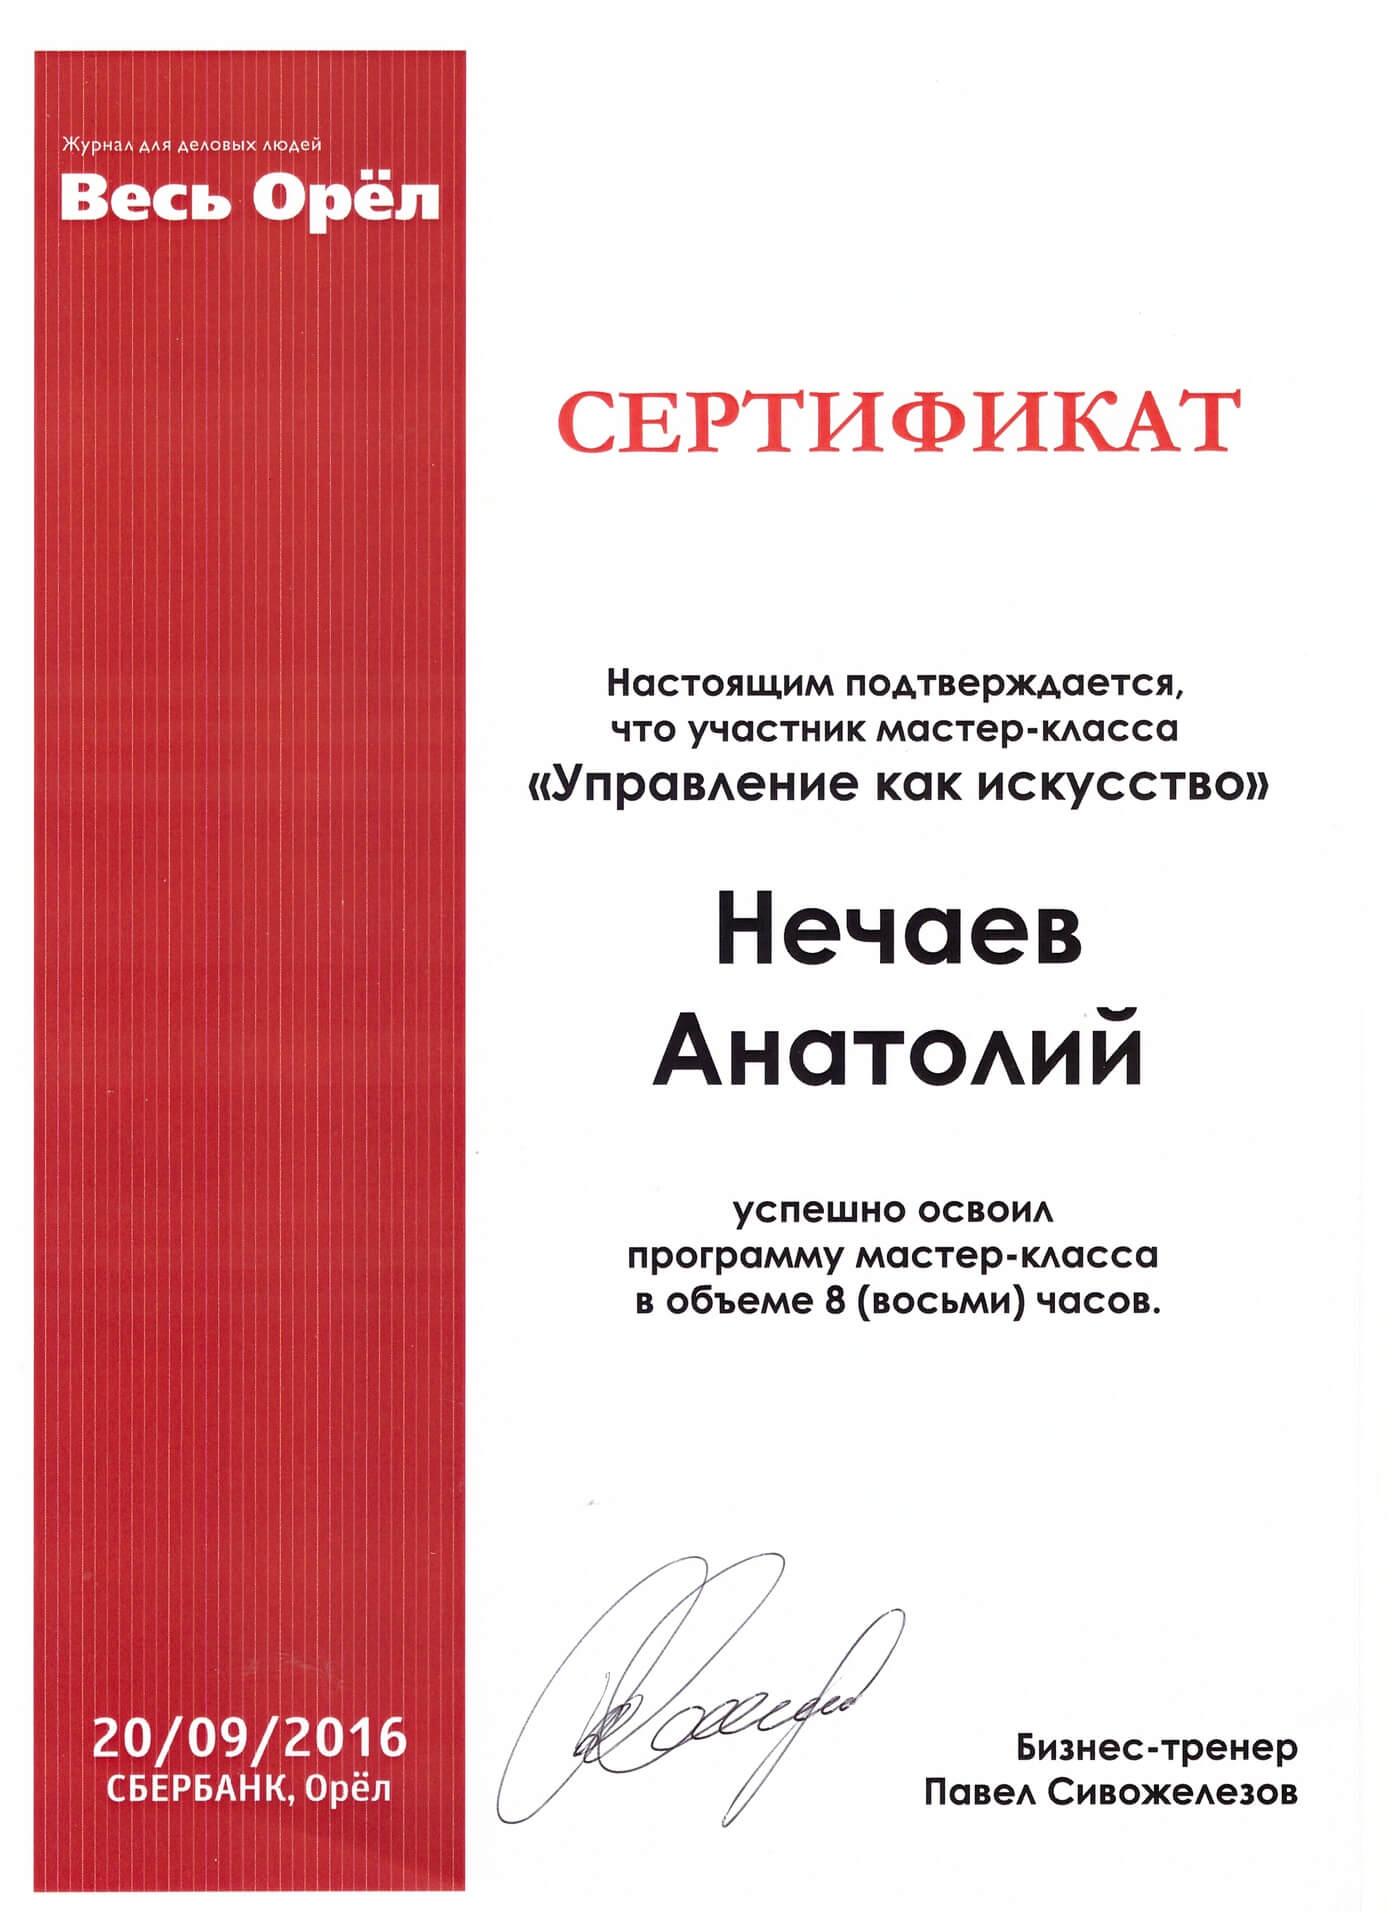 nech_license_three